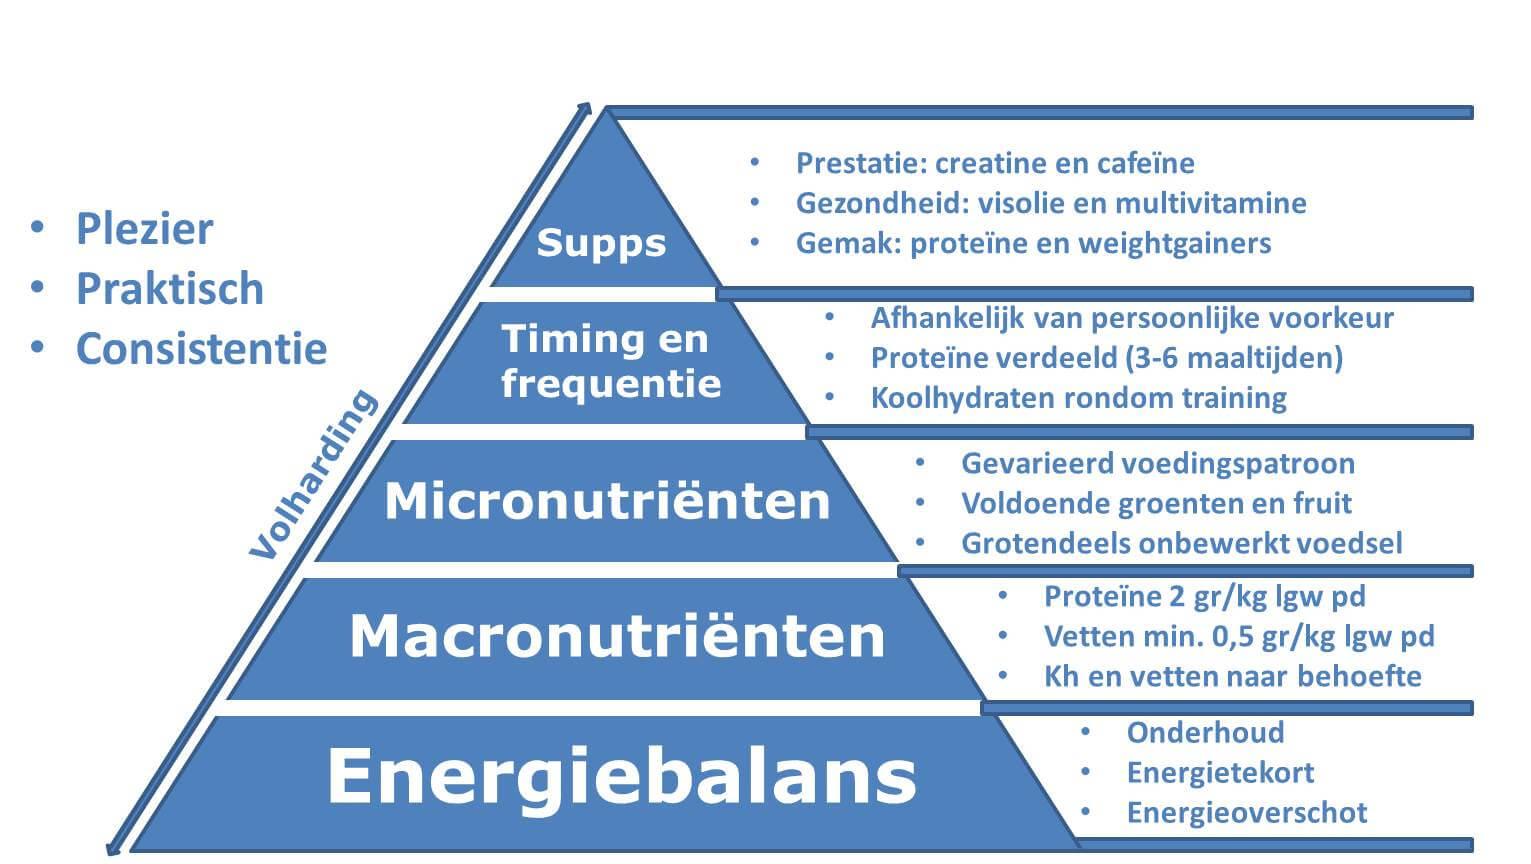 Pyramide-6-fundamenten-van-voeding